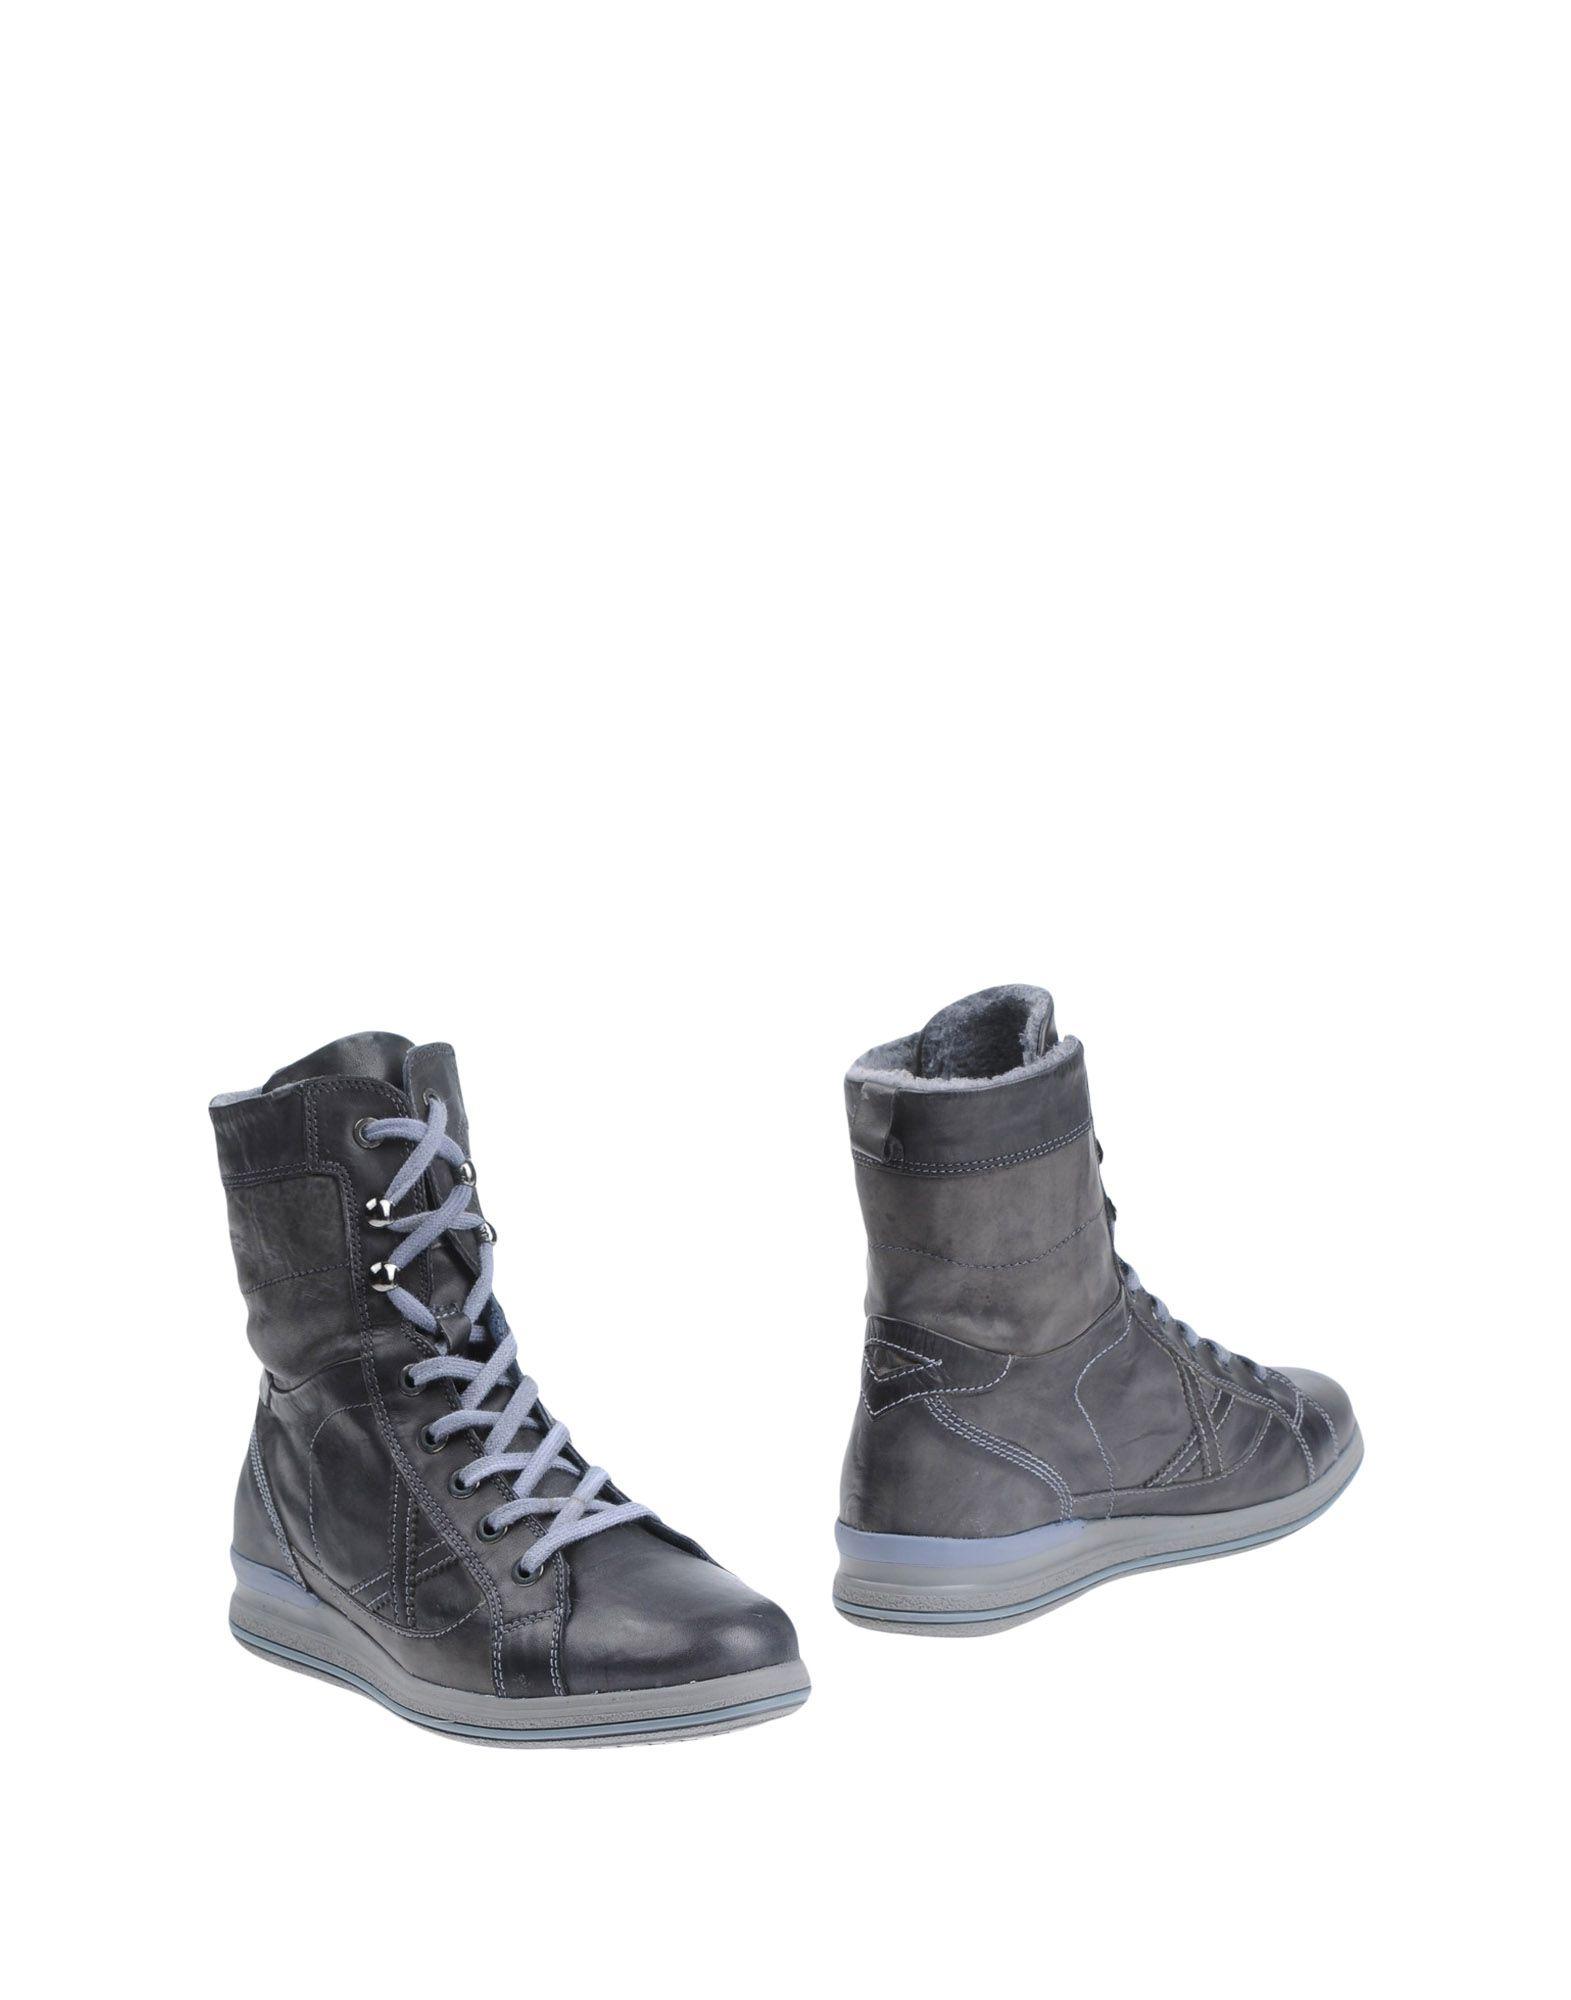 Sneakers Munich Donna - Acquista online su